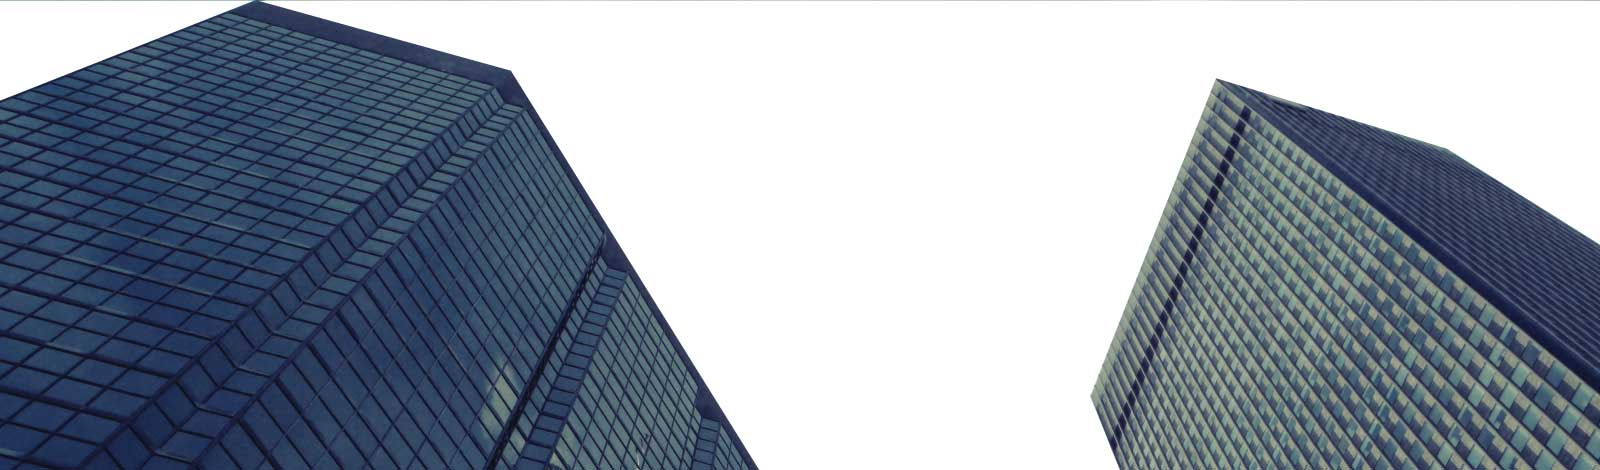 Taxateur-zakelijk-vastgoed-achtergrond